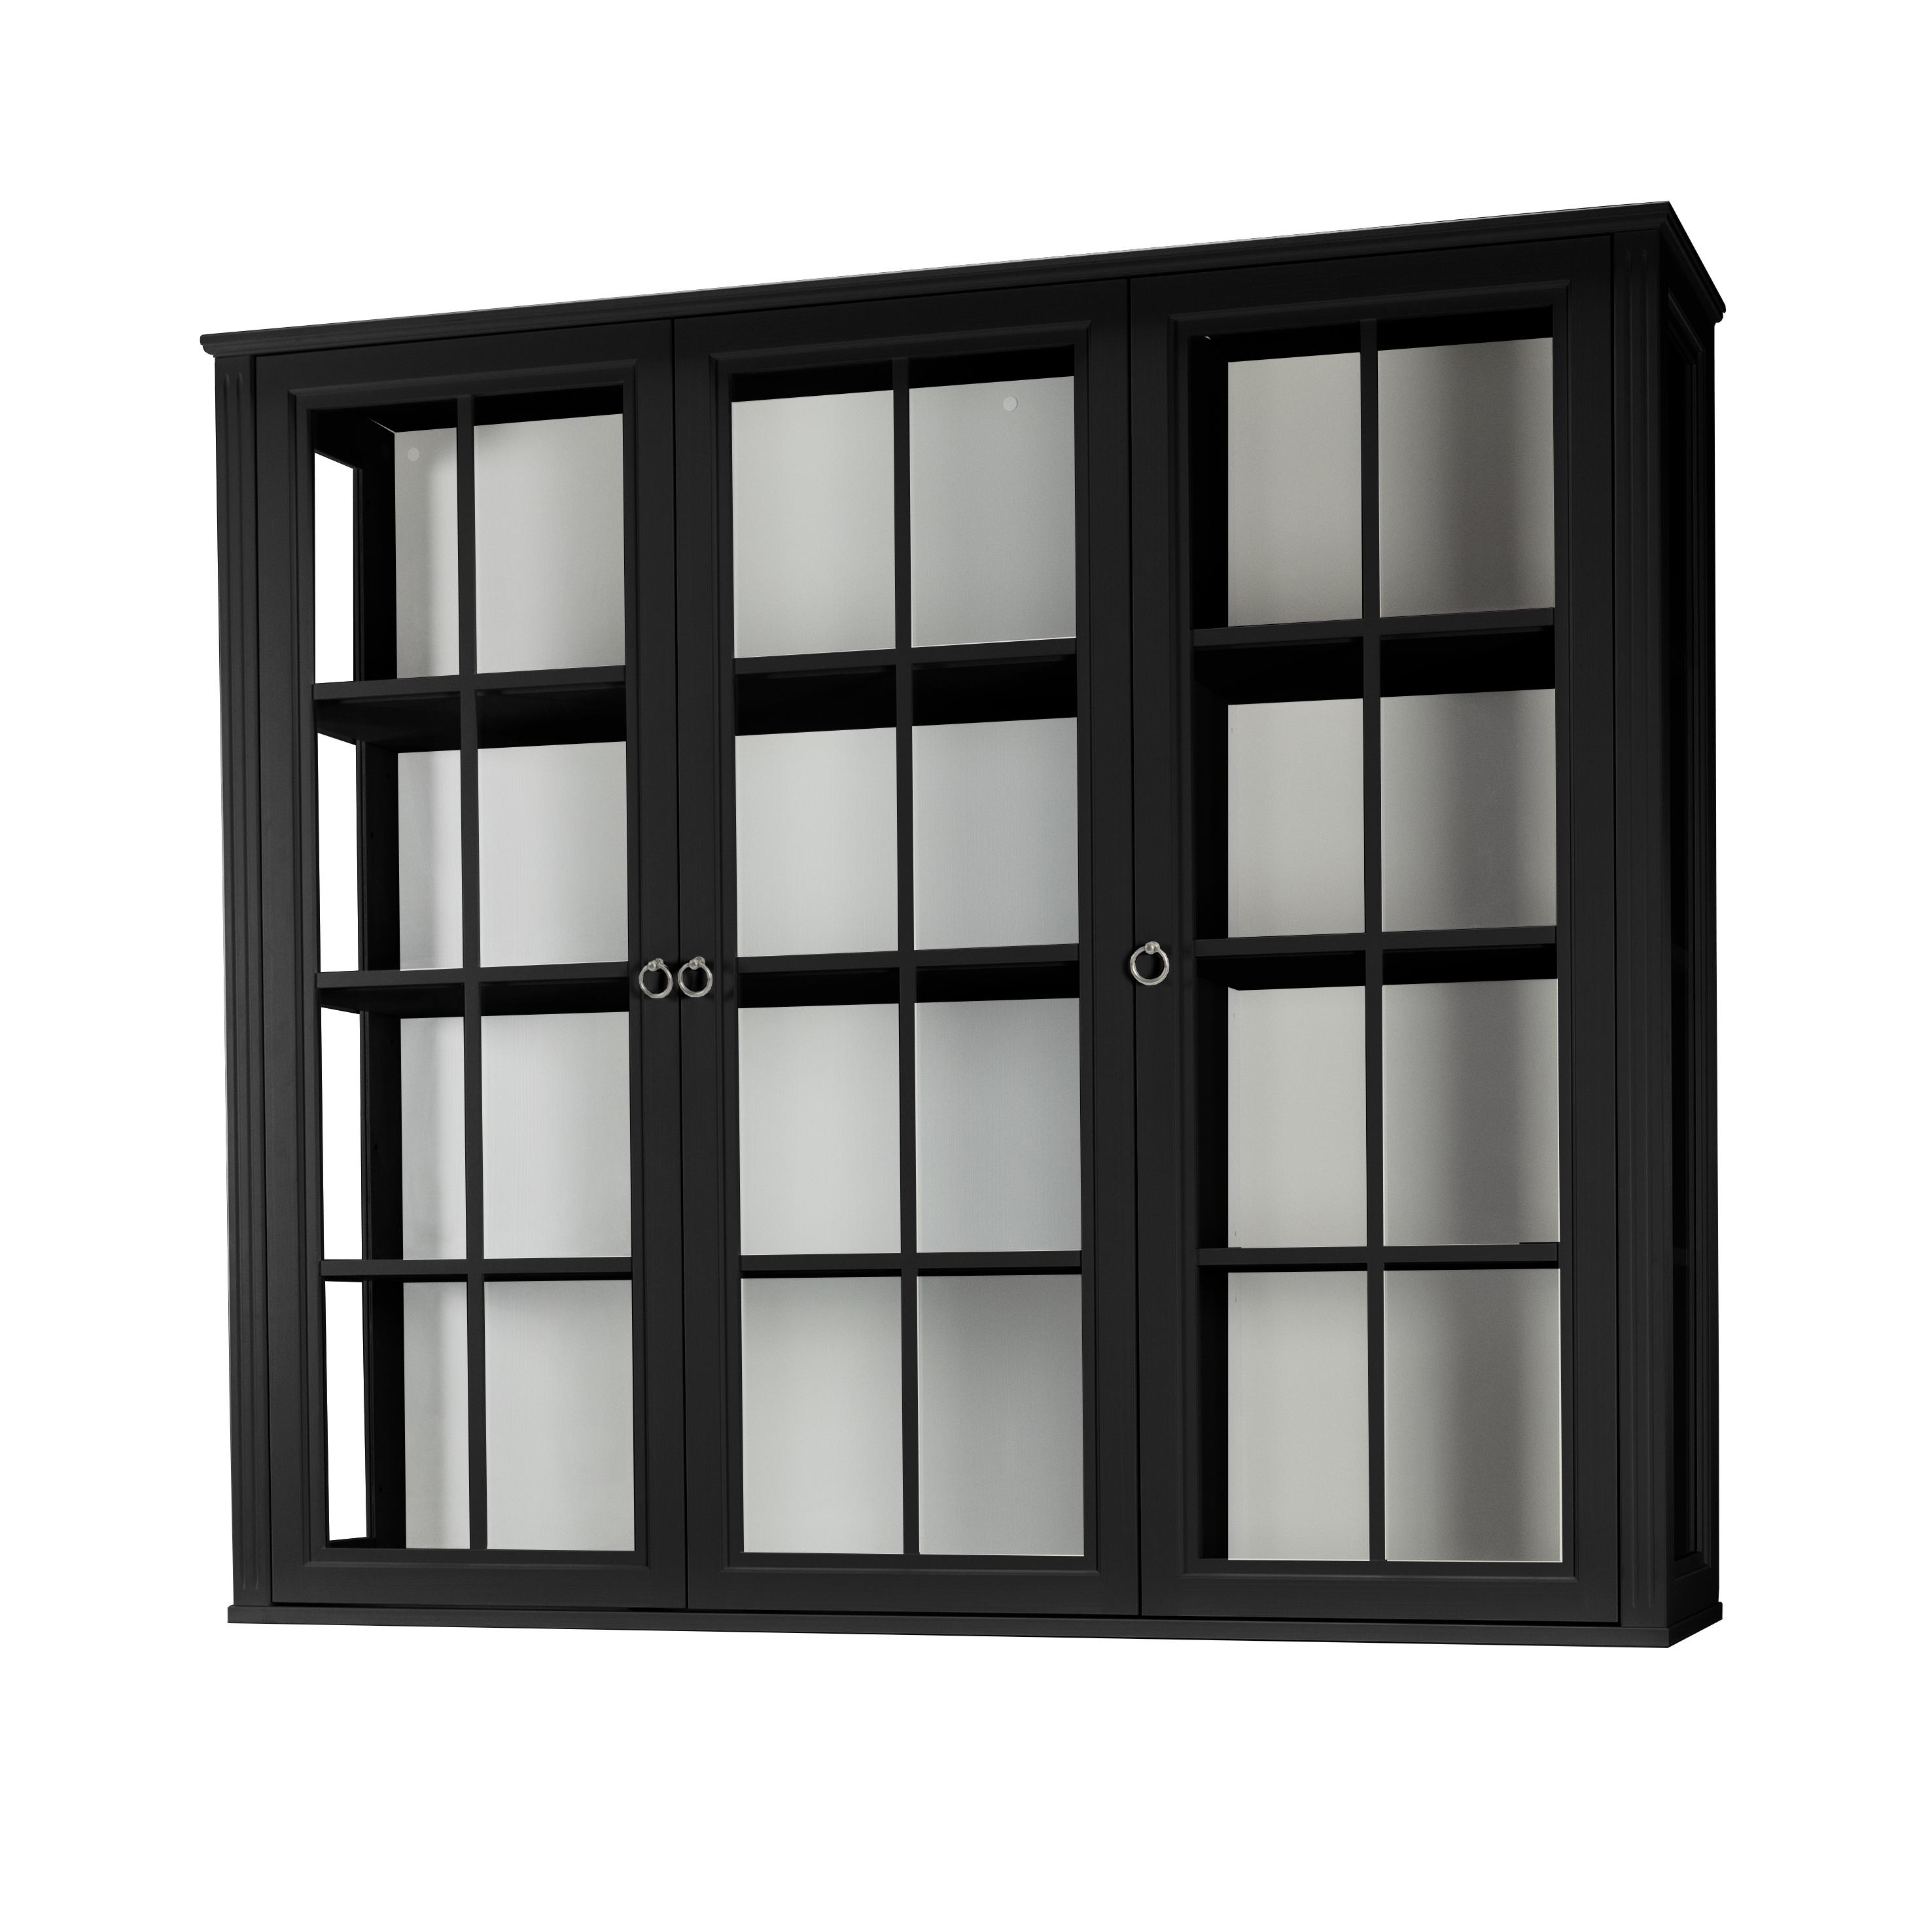 Stockholm 2.0 Vitrin glassidor 3 vitrindörrar